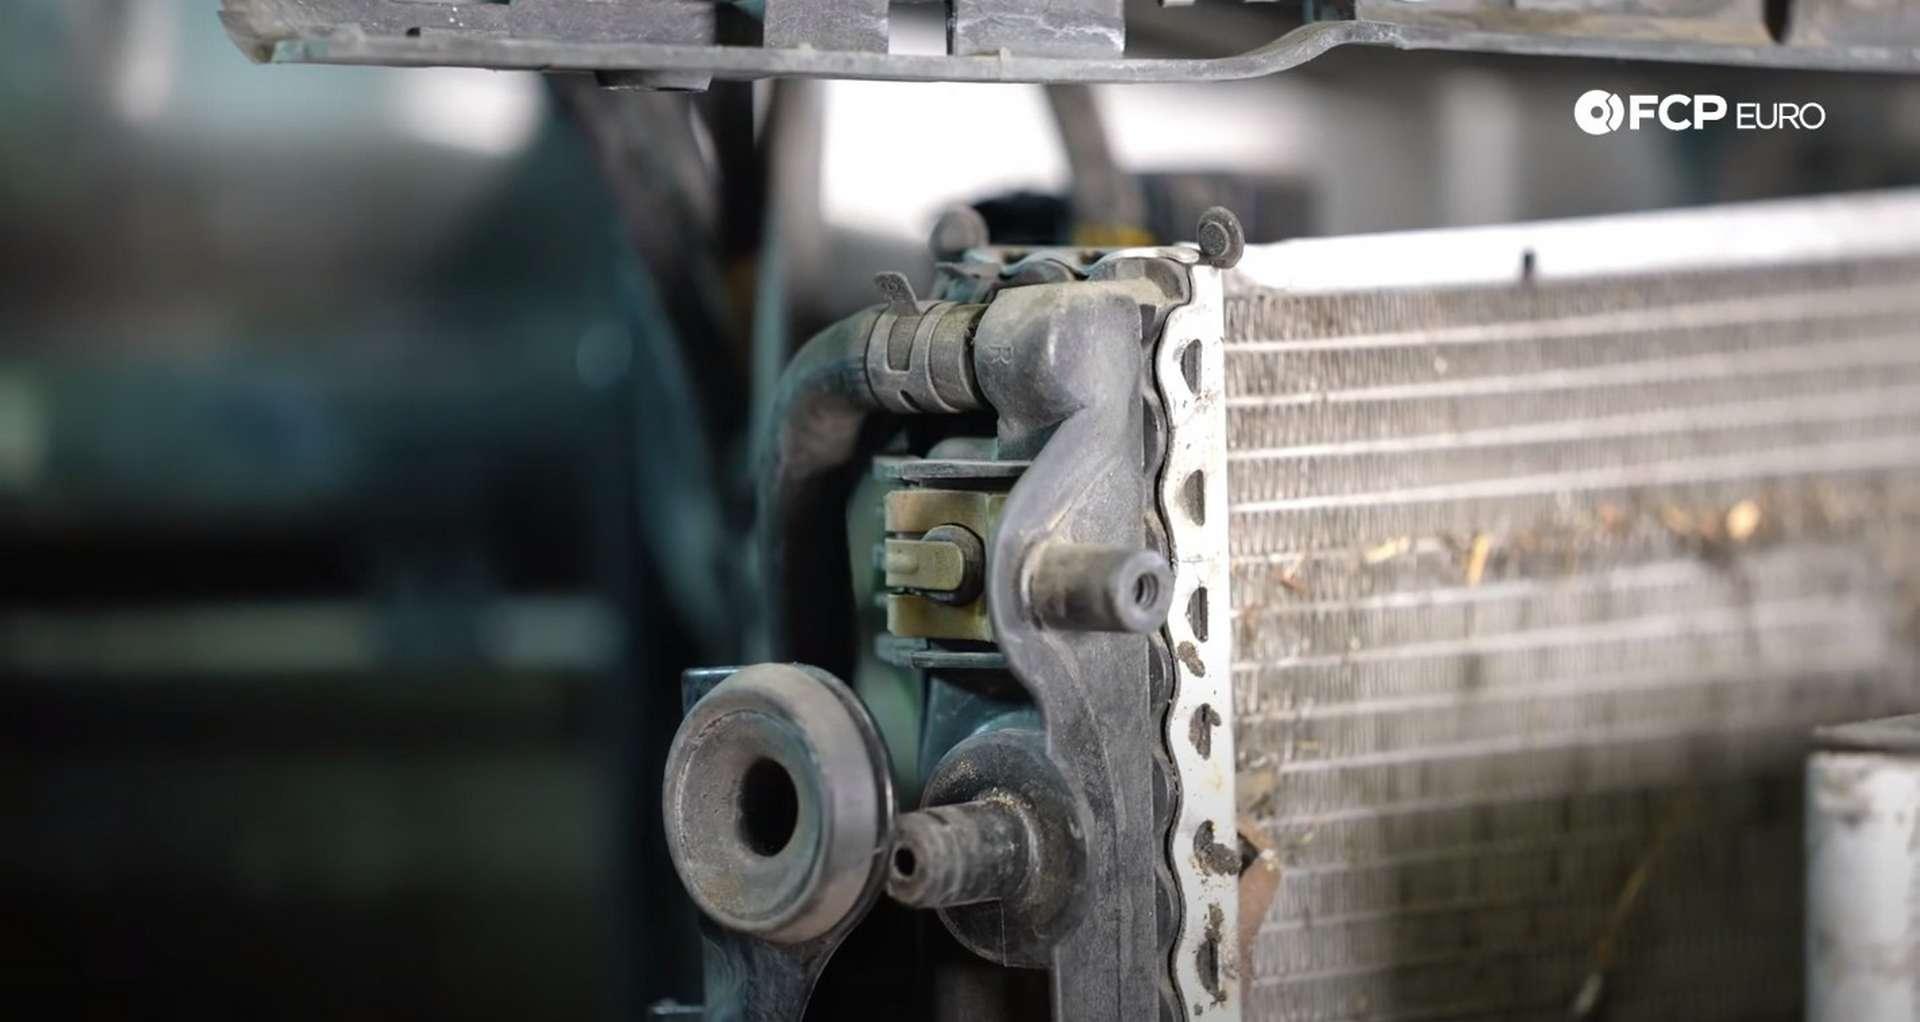 DIY Porsche 996 Radiator Replacement small upper rad hose